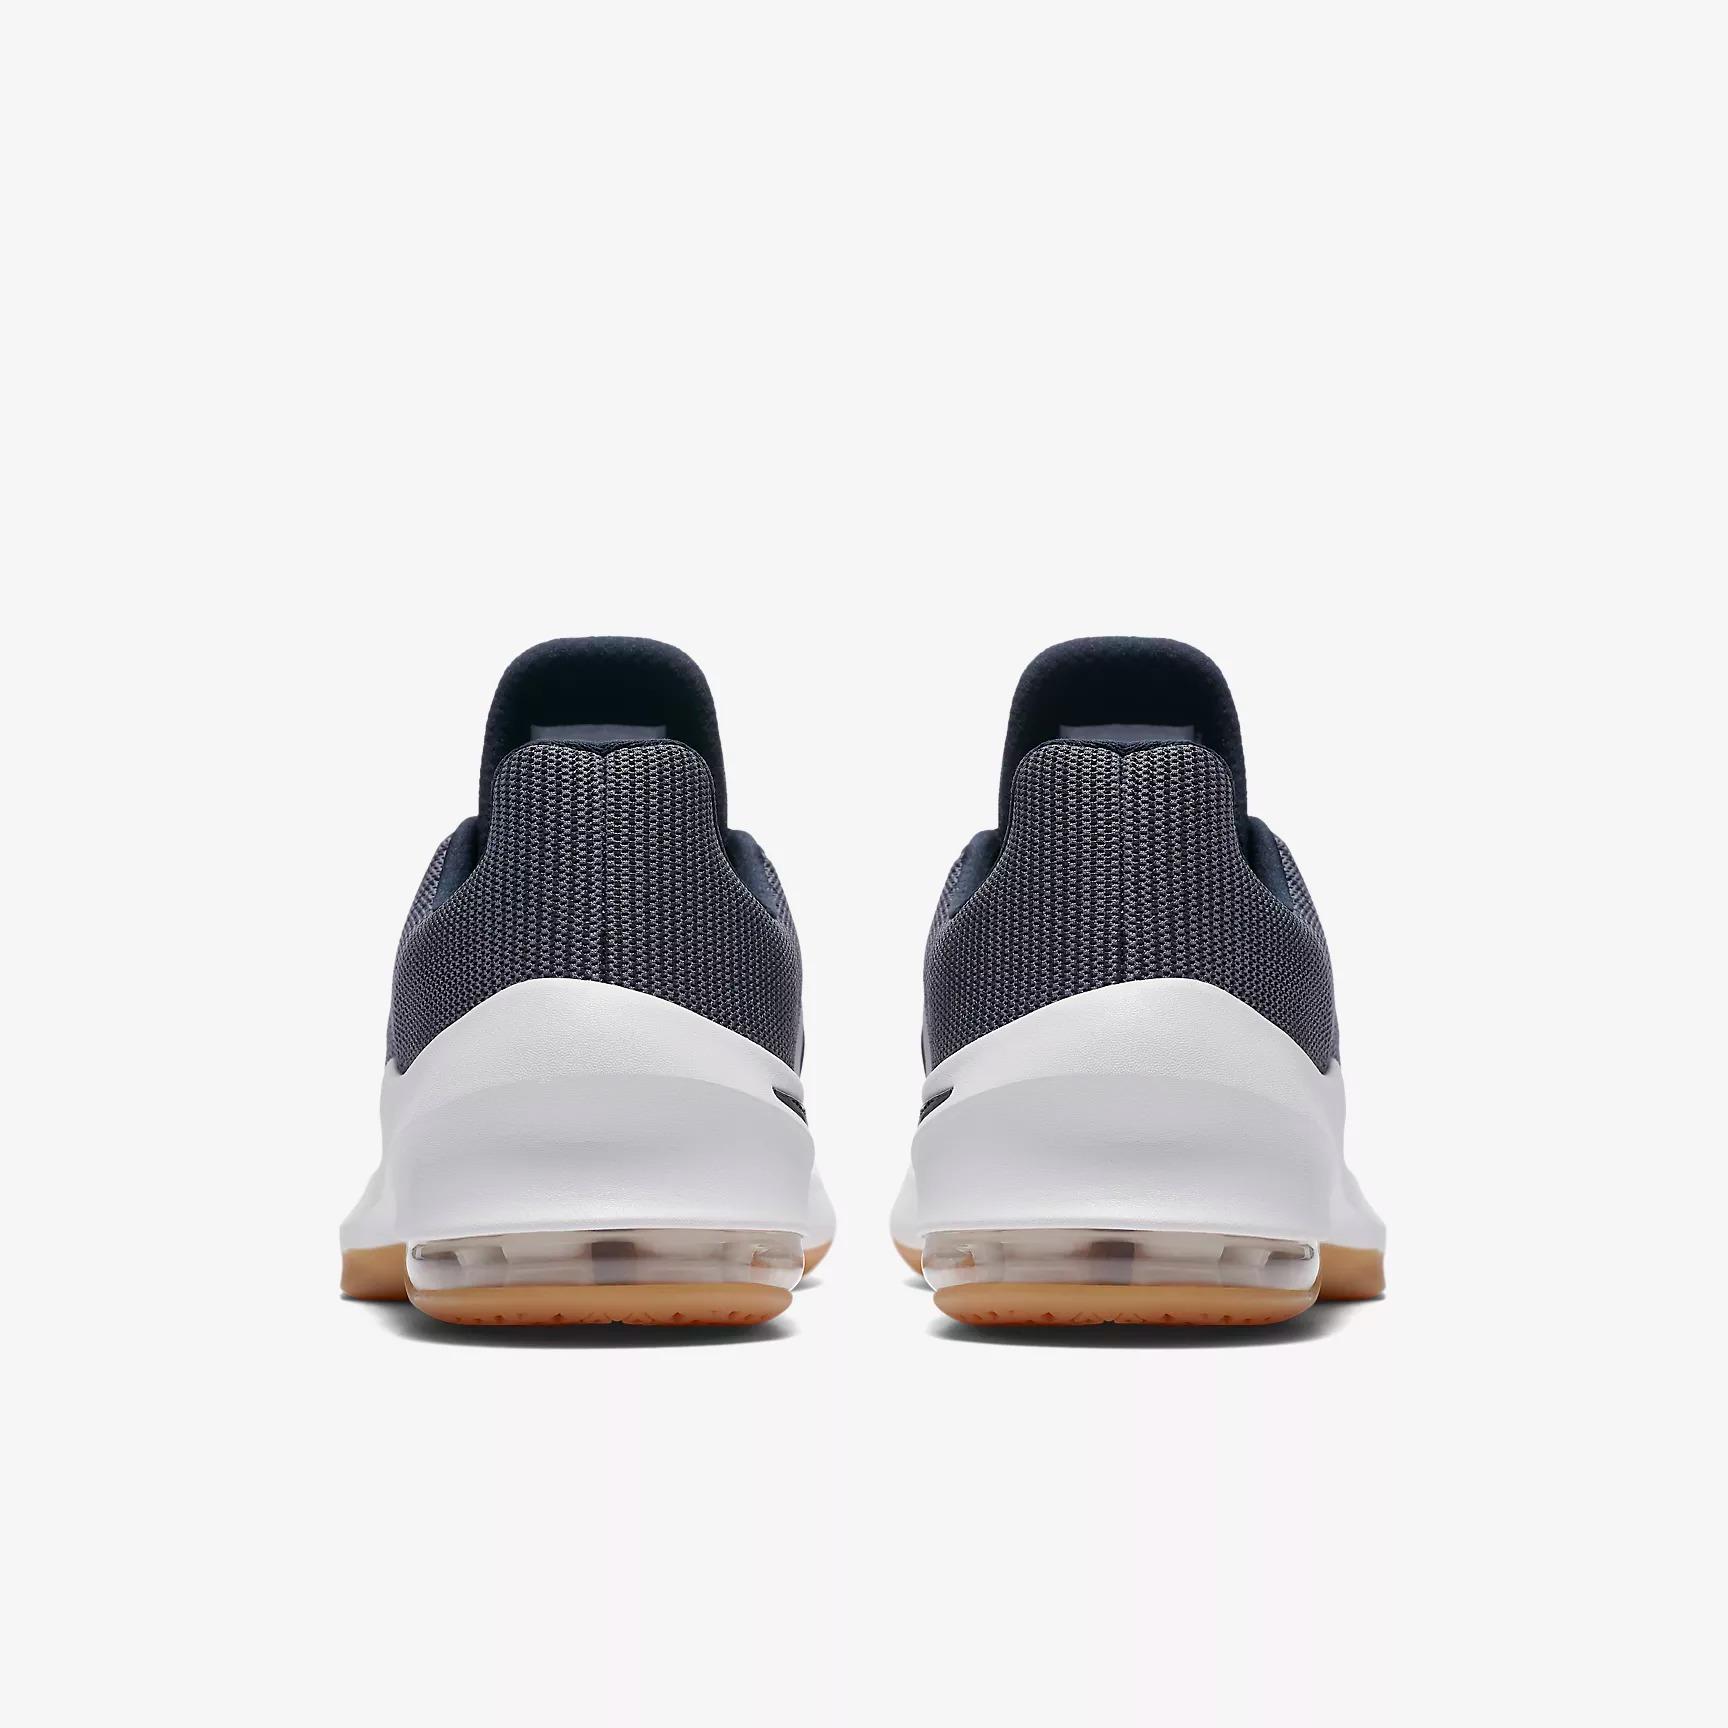 5cd64bbf9a236 Nike Air Max Infuriate 2 Low - BASKETBALL SHOES NIKE Basketball ...